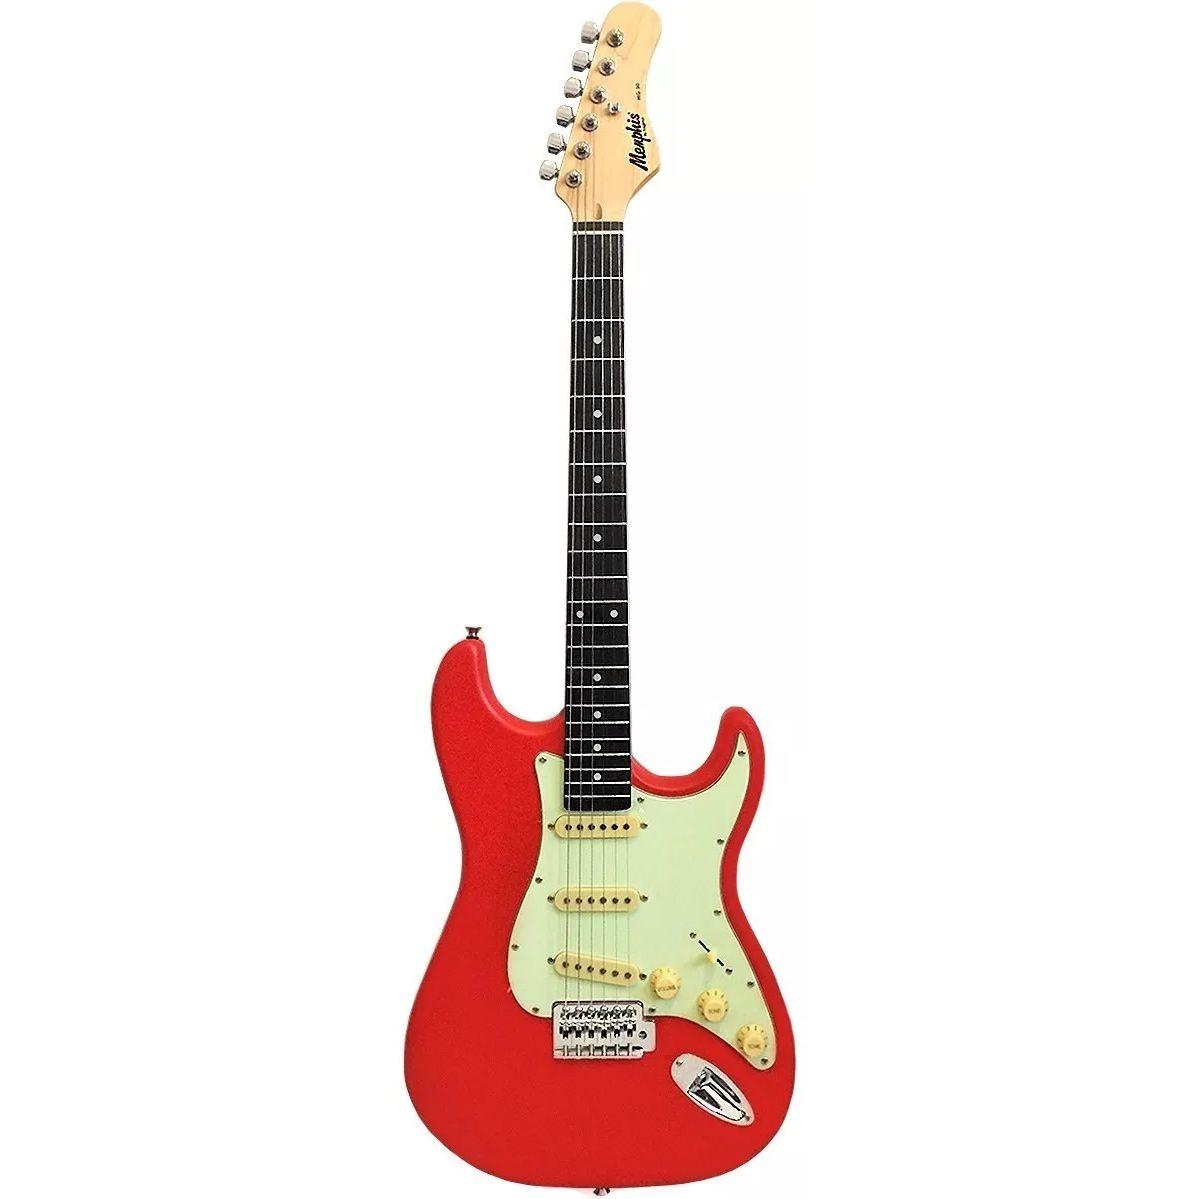 Guitarra MEMPHIS Tagima MG 30 FRS Fiesta Red Satin Escudo MG Mintgreen